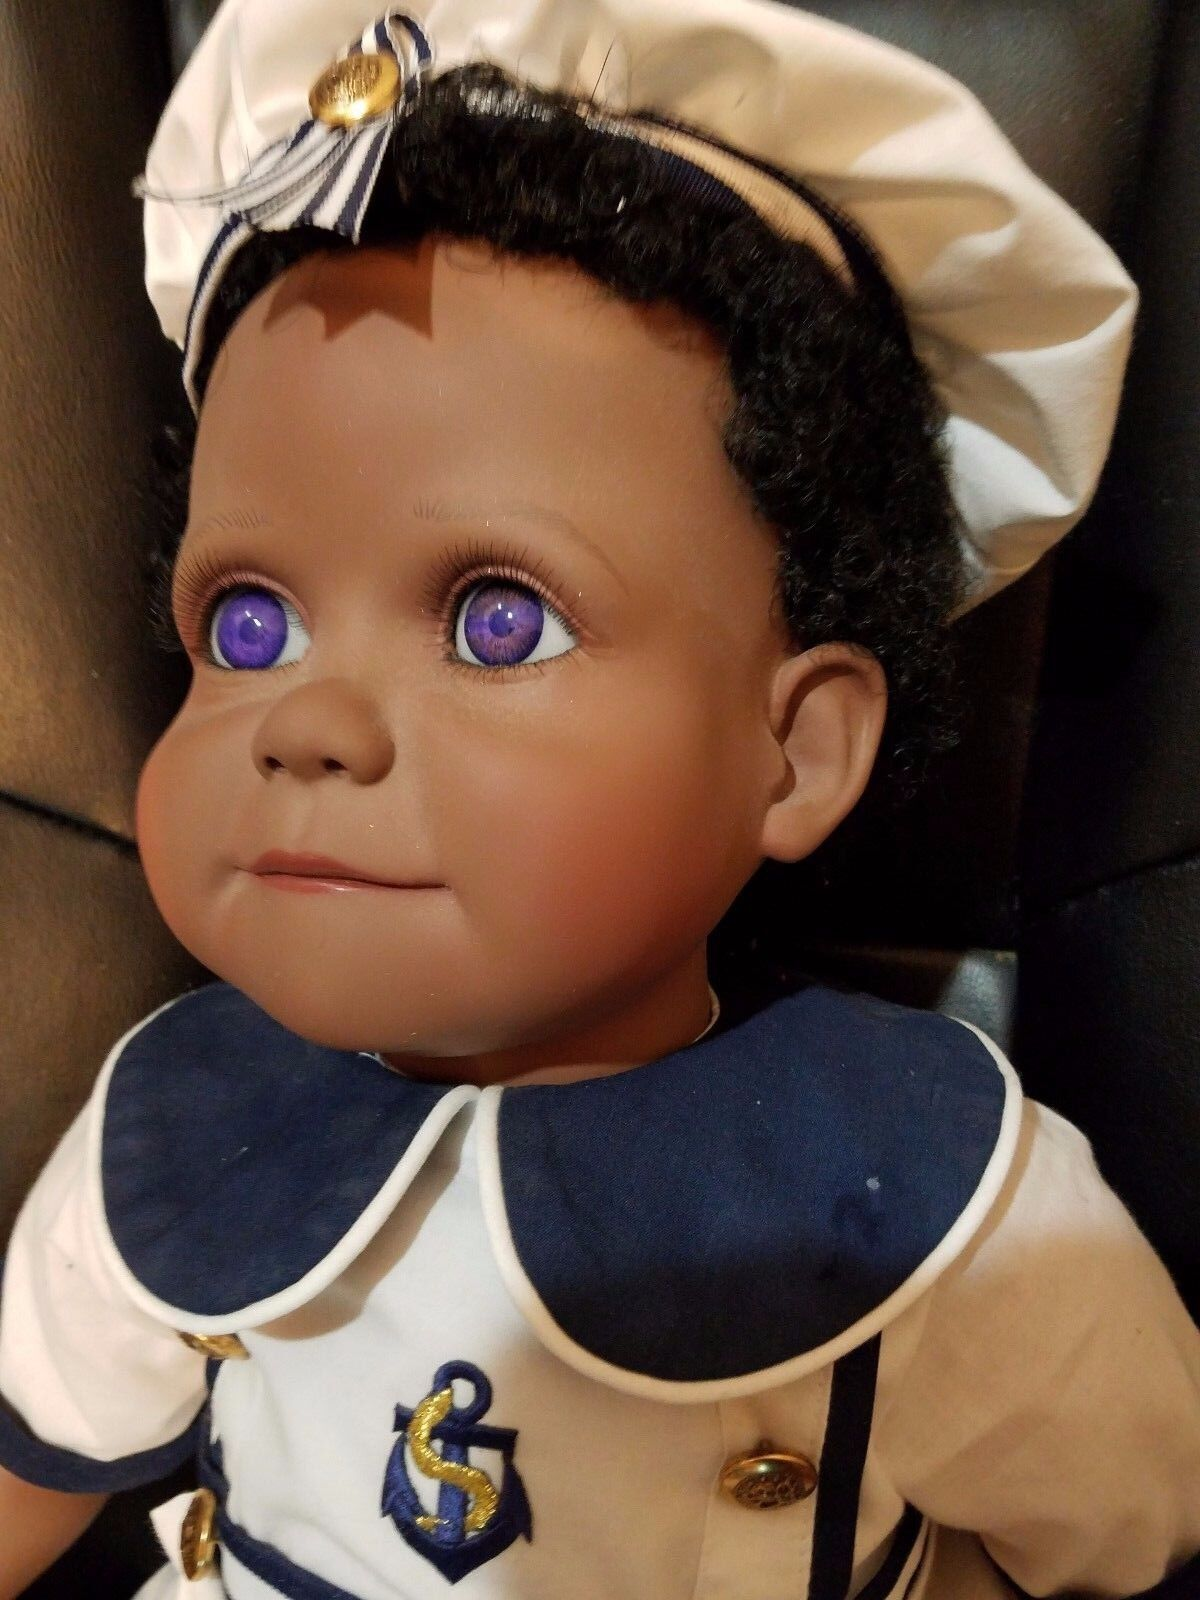 Muñeca por Virginia Turner 24  Vinilo Negro Negro Negro Macho marinegro muñeca GWd  100% precio garantizado